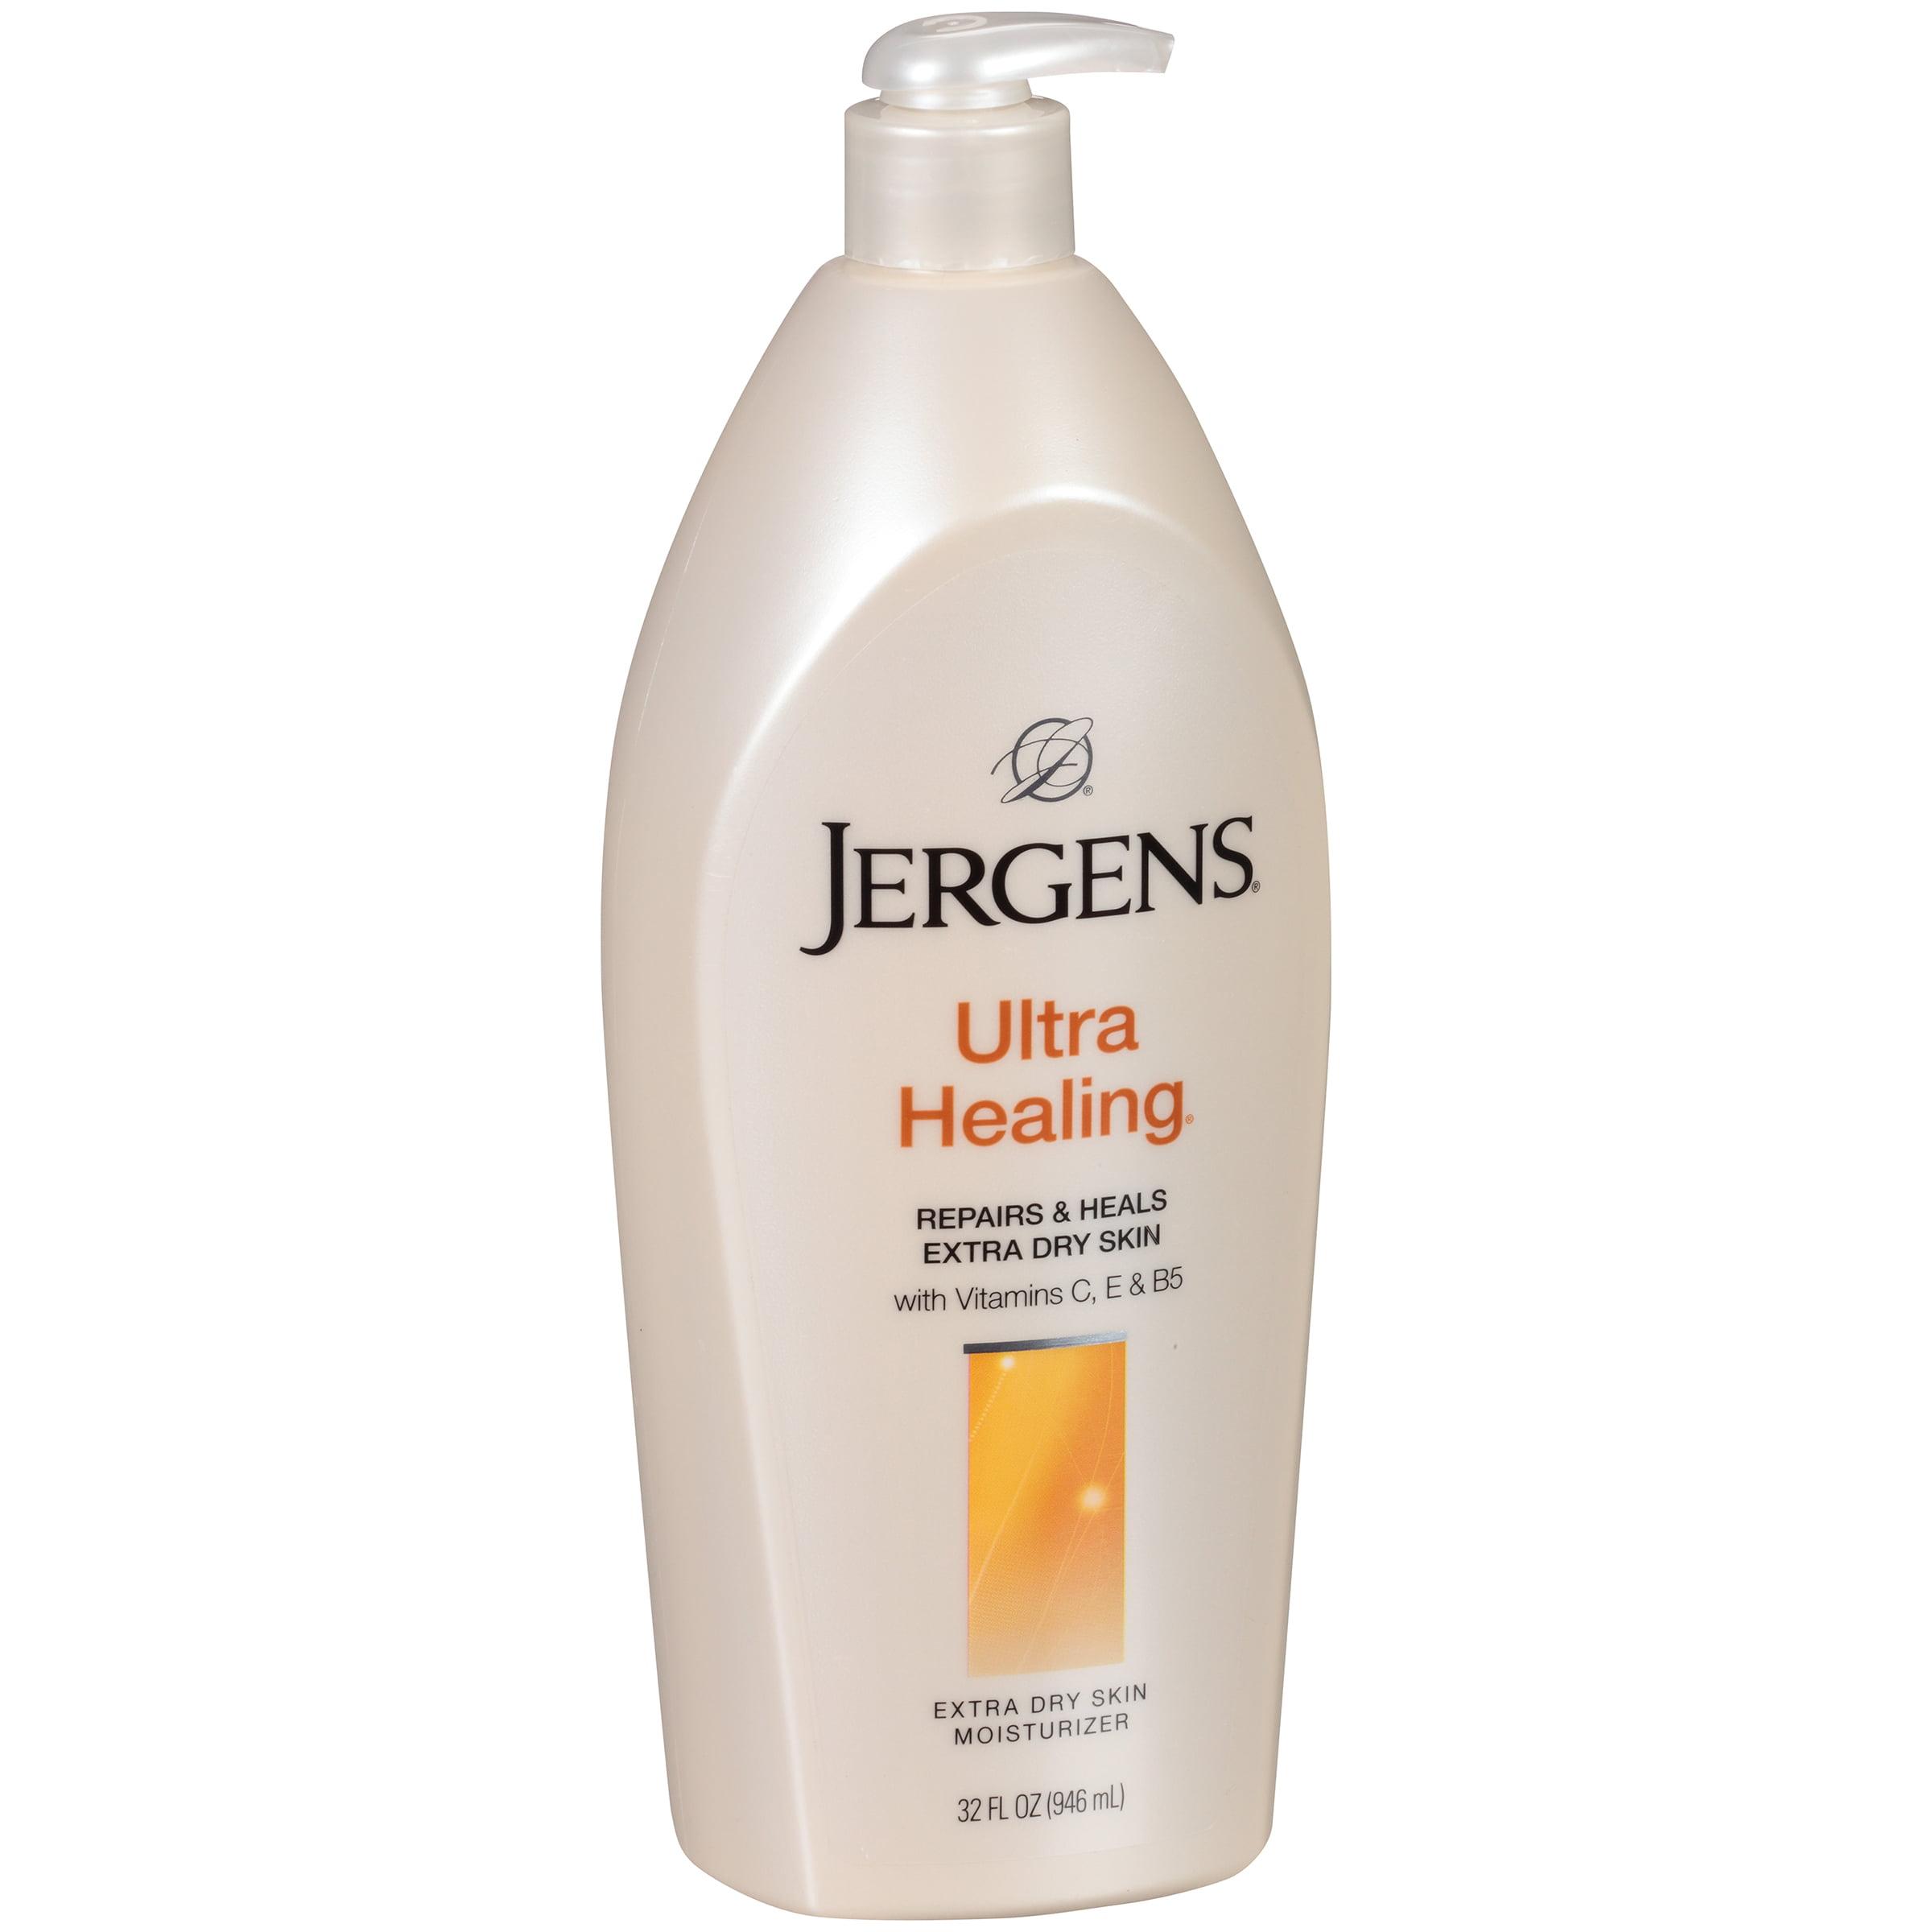 Jergens Ultra Healing Extra Dry Skin Moisturizer 32 fl. oz. Pump Bottle